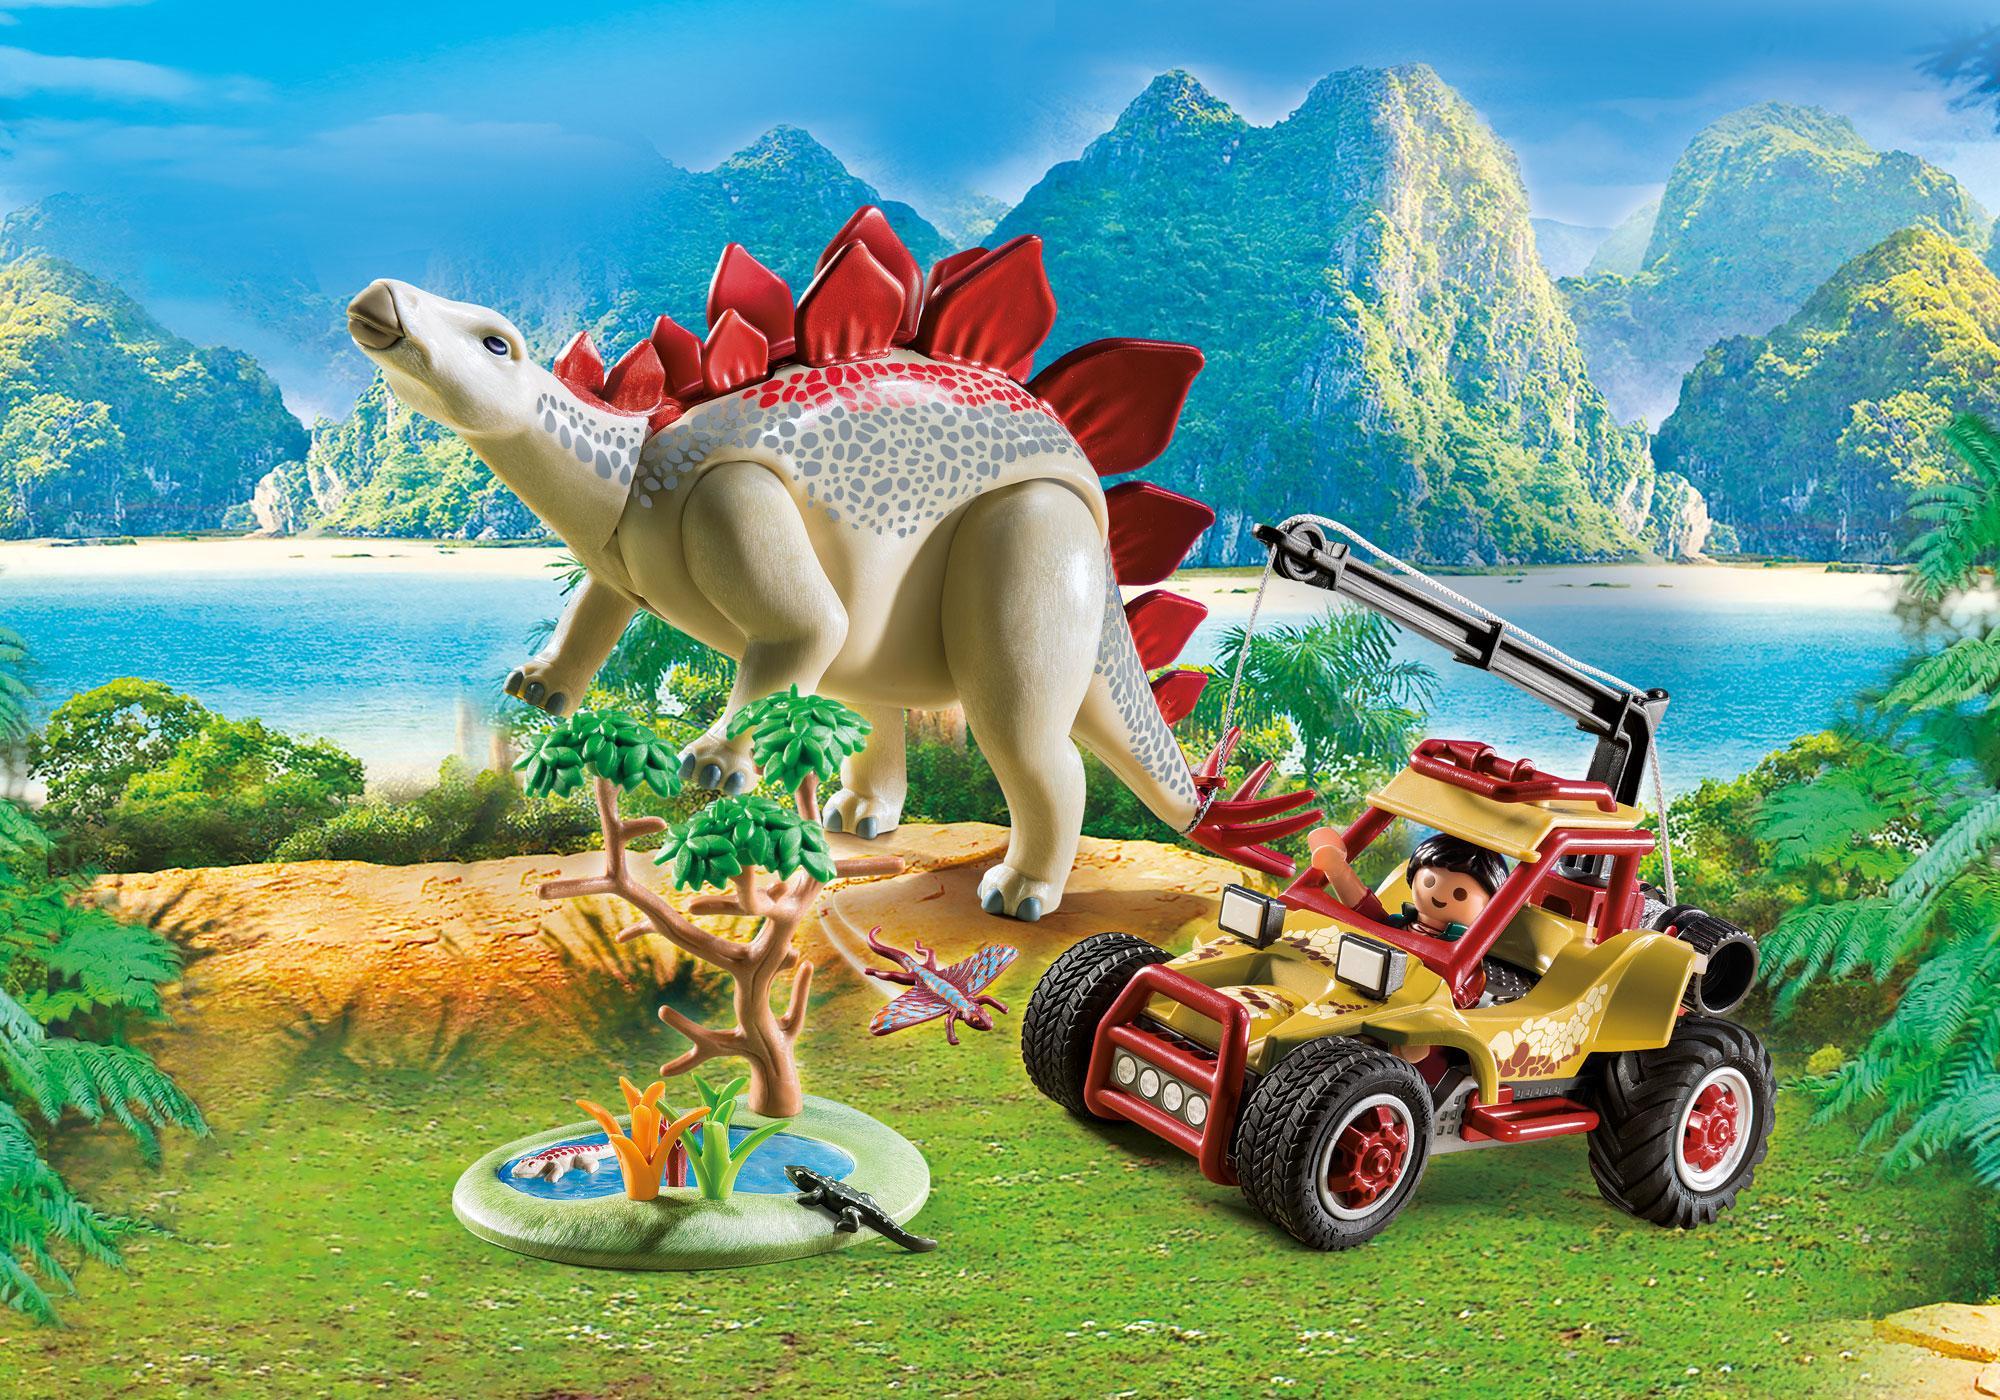 9432_product_detail/Vehicle With Stegosaurus